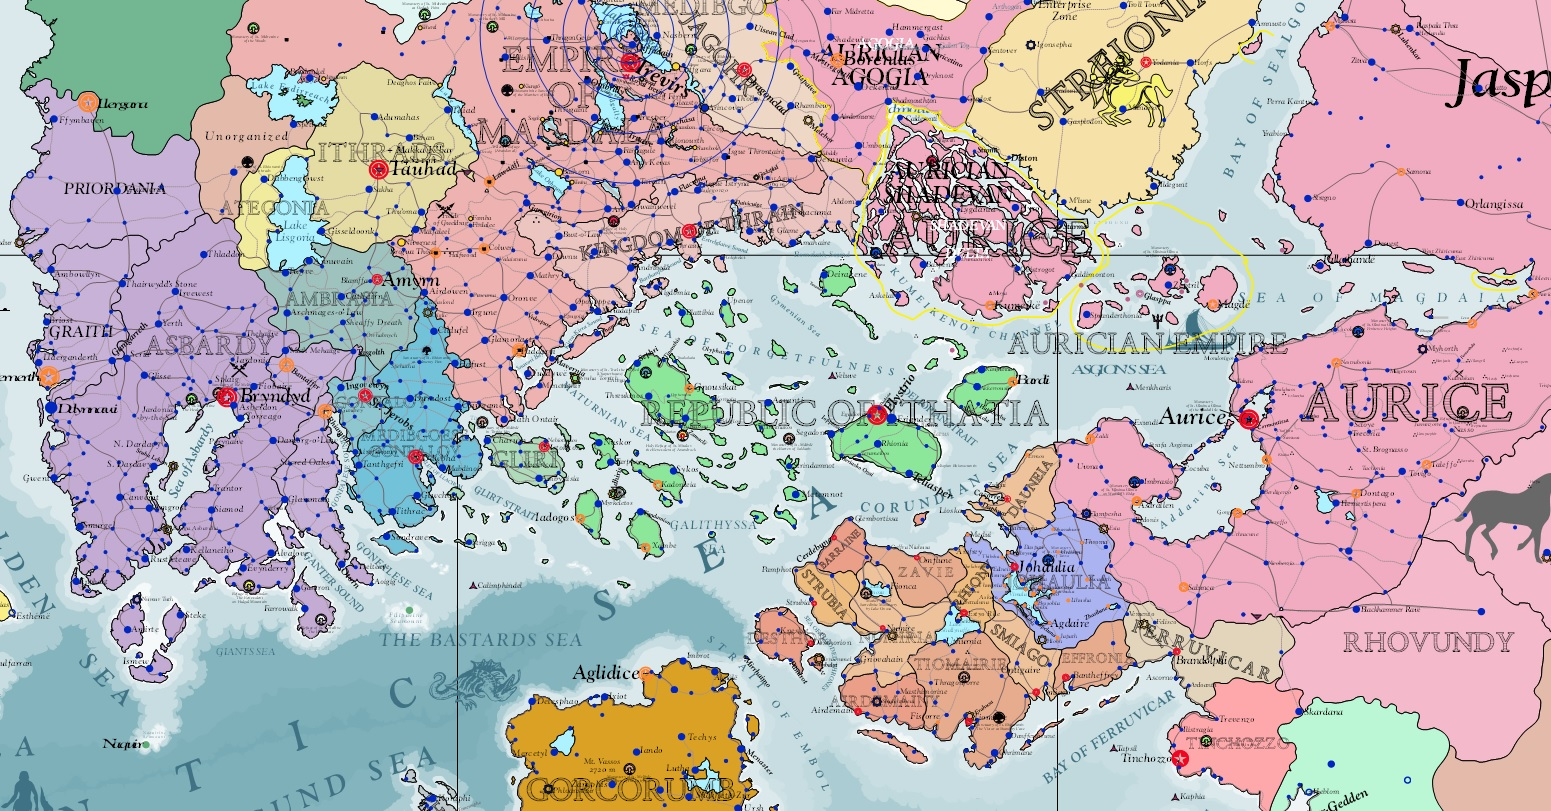 MapPoliticalPallathantic2740